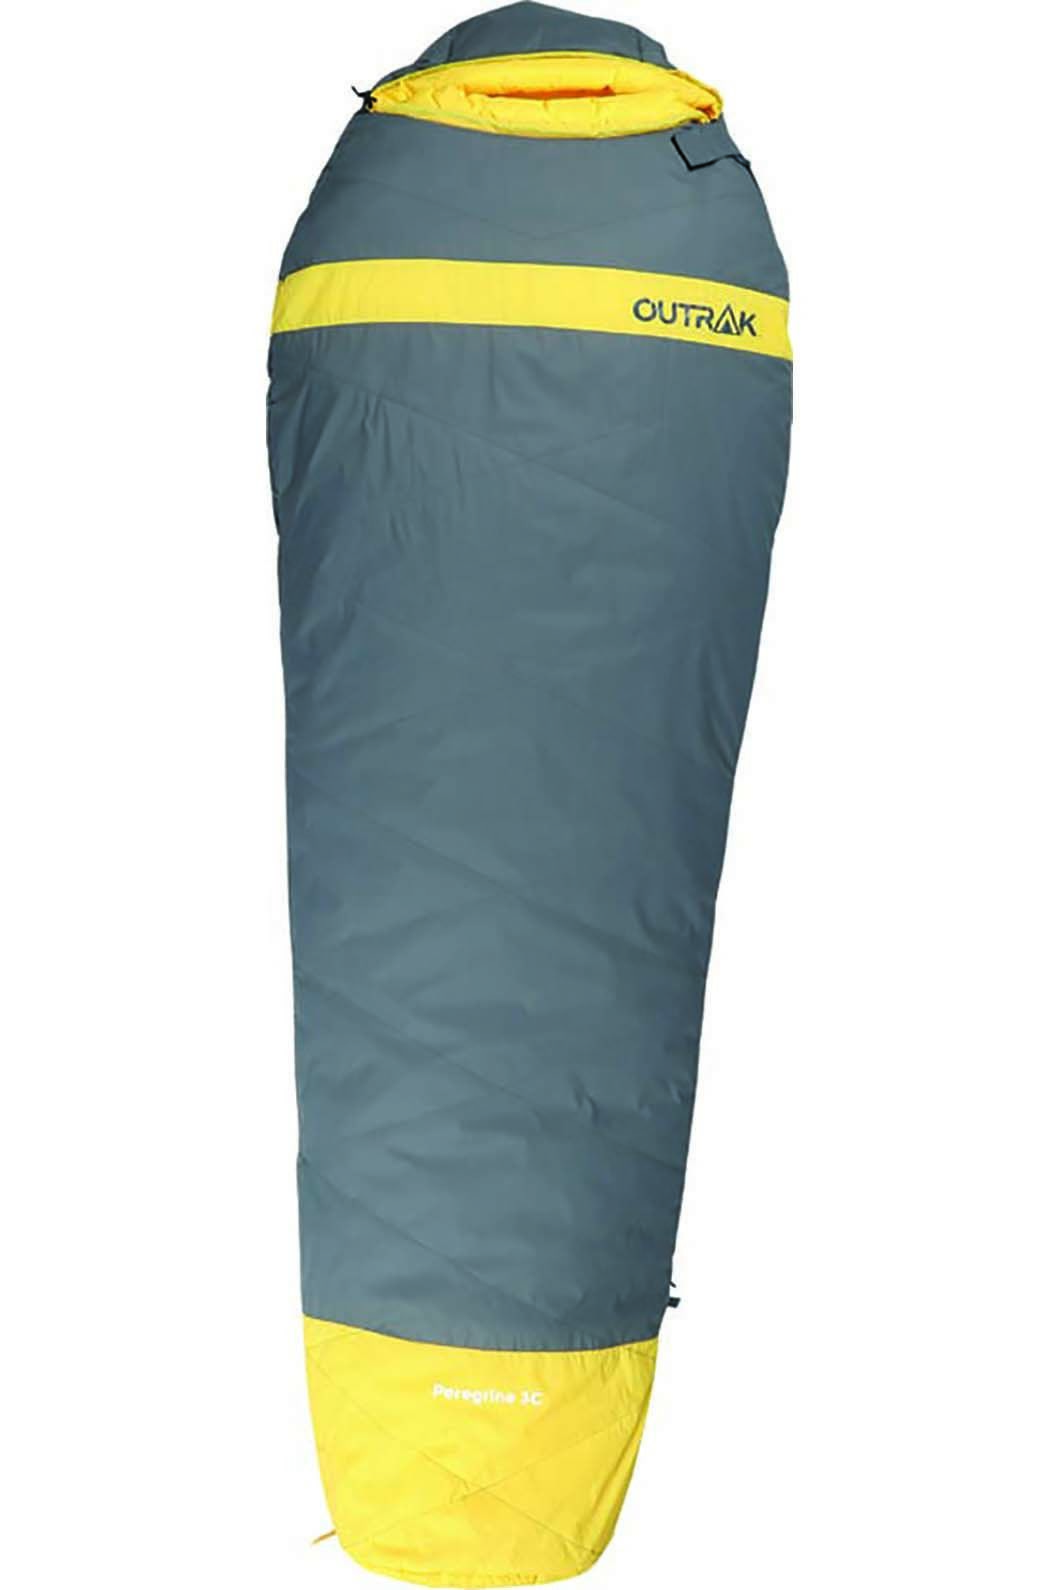 Outrak Peregrine Sleeping Bag 3 Yellow, None, hi-res